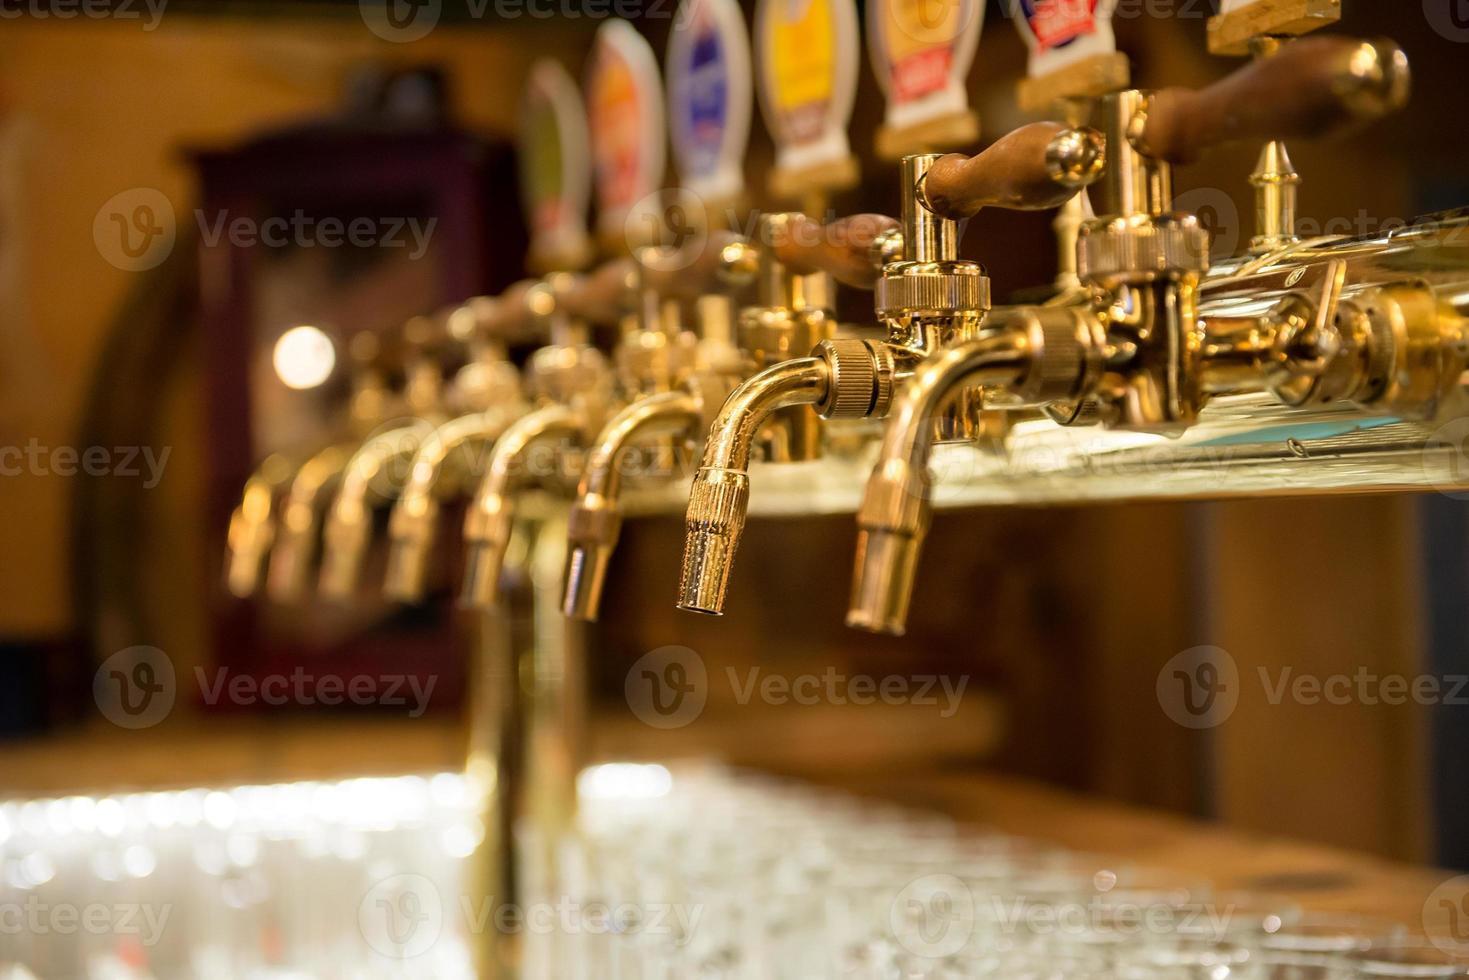 diversi rubinetti di birra di fila foto